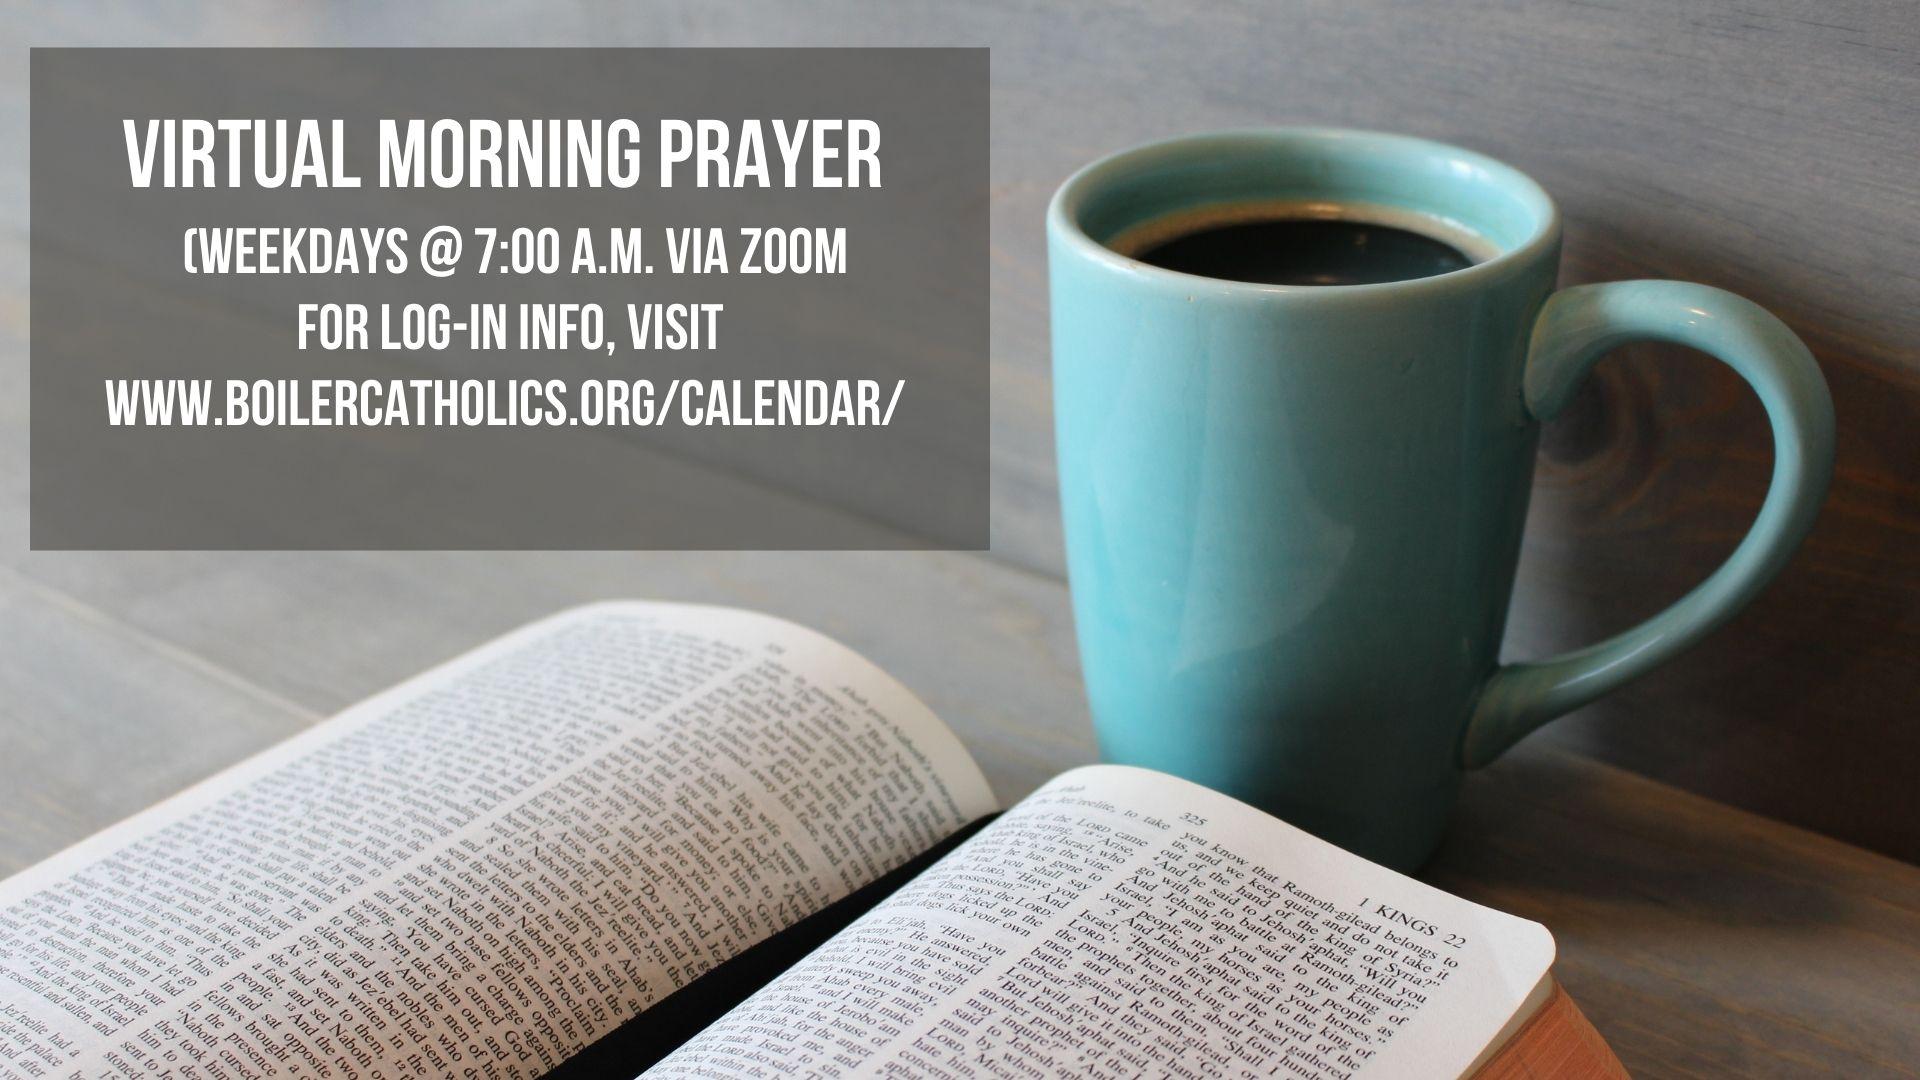 Copy of Morning Prayer